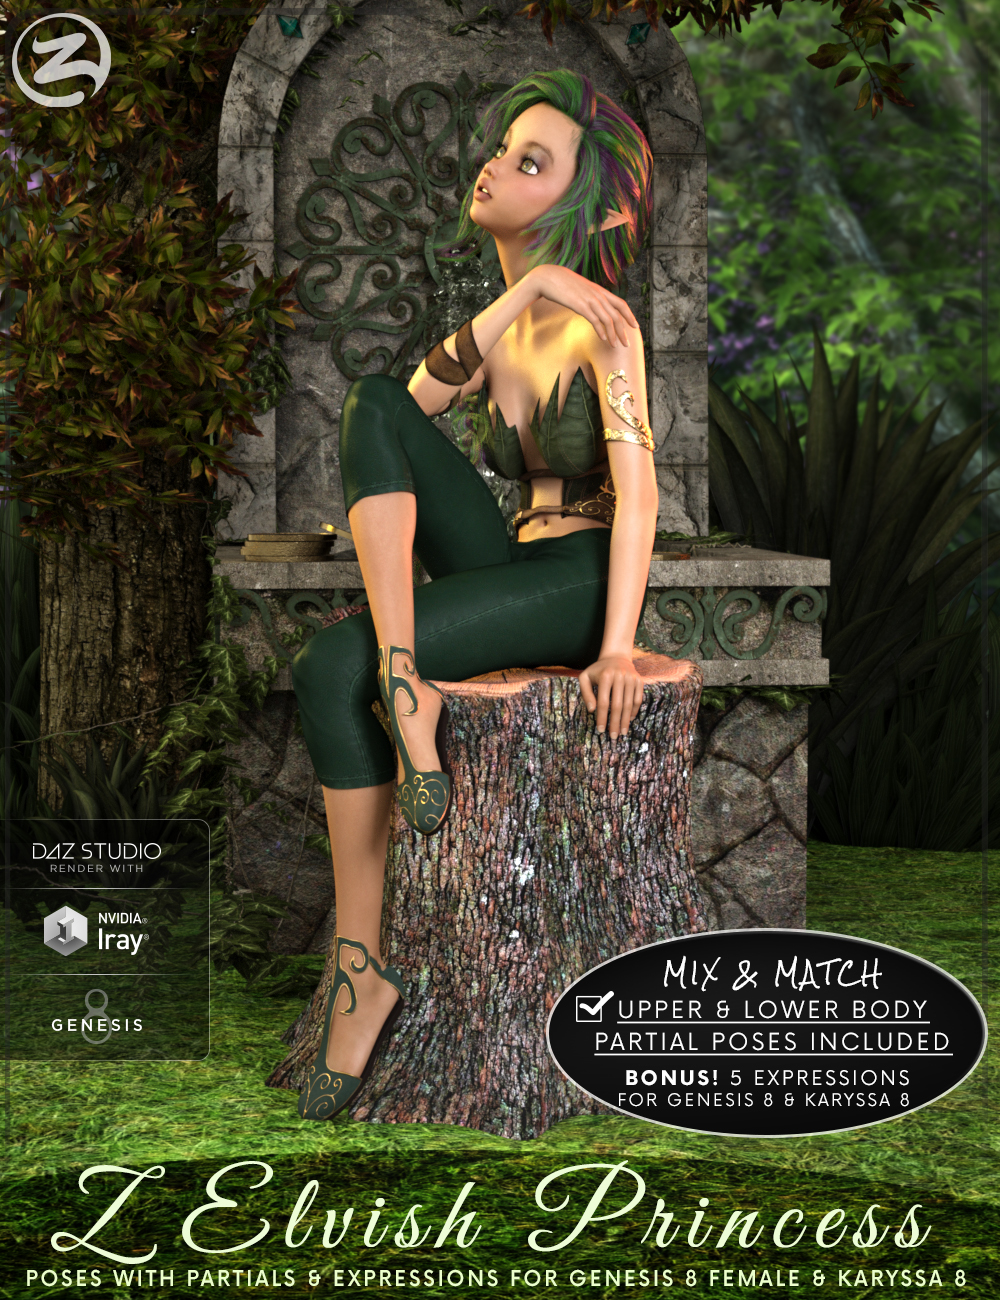 Z Elvish Princess - Poses, Partials and Expressions for Genesis 8 Female and Karyssa 8 by: Zeddicuss, 3D Models by Daz 3D